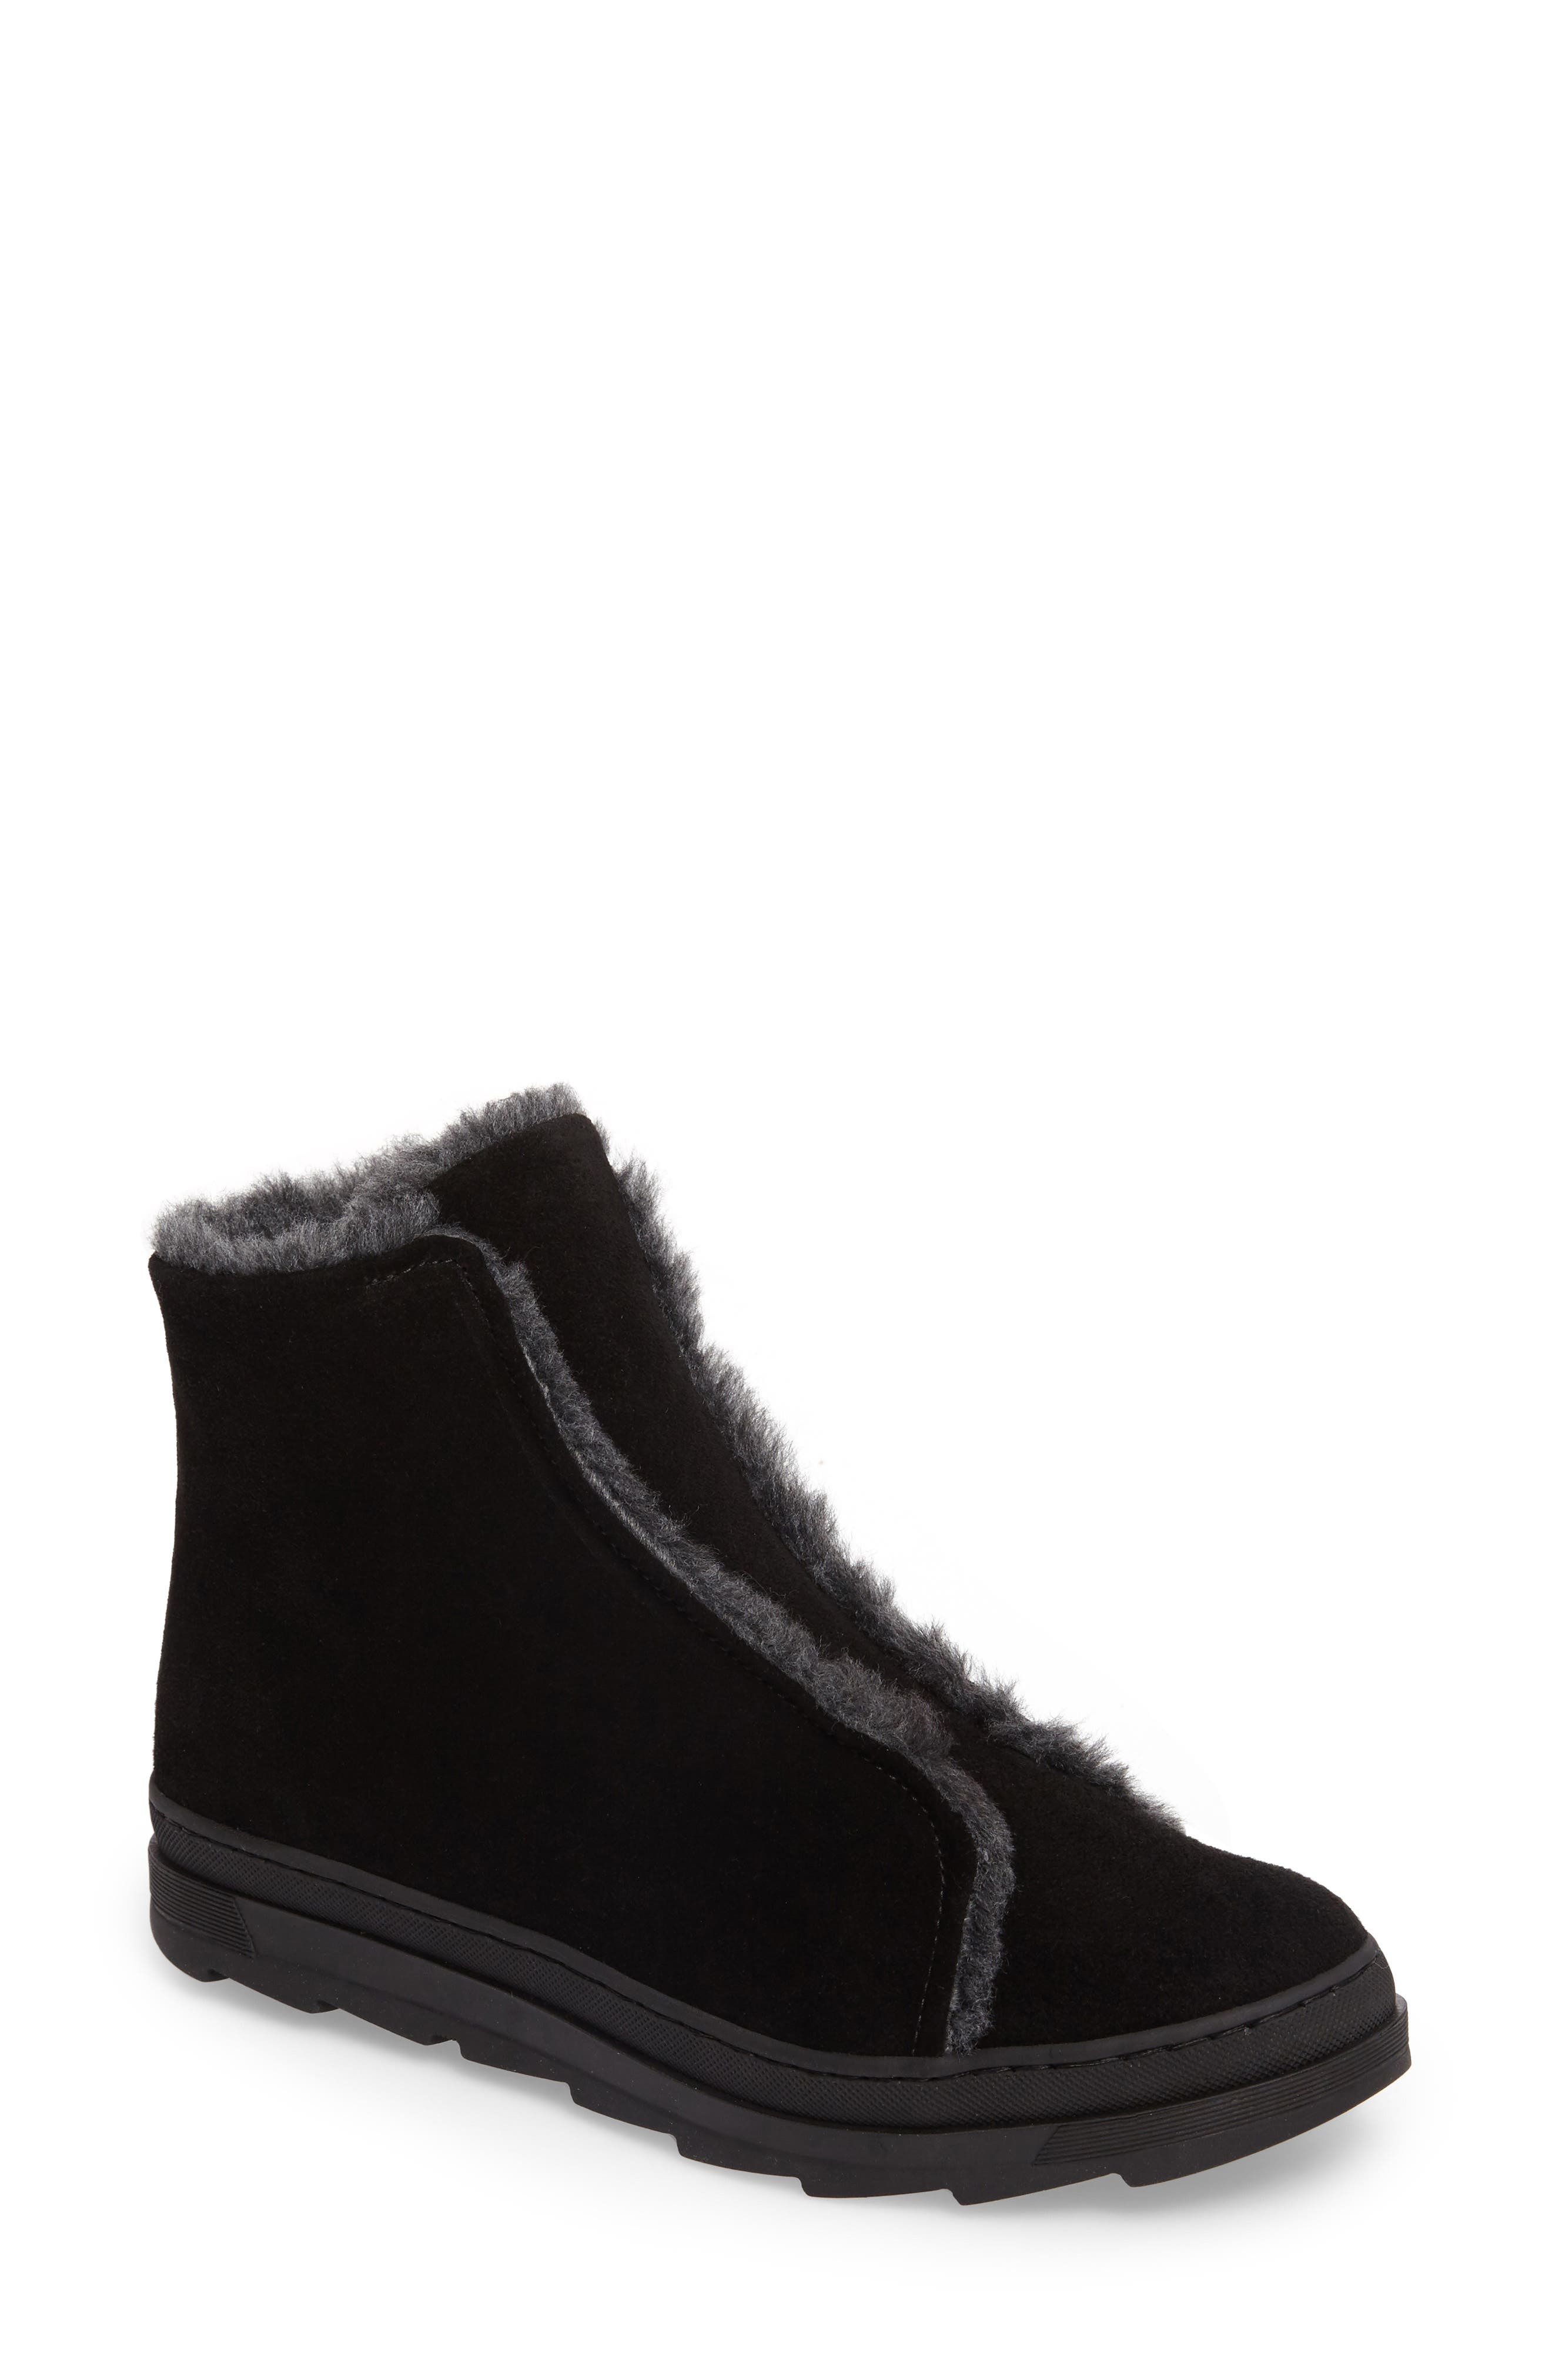 Virina Boot,                         Main,                         color,